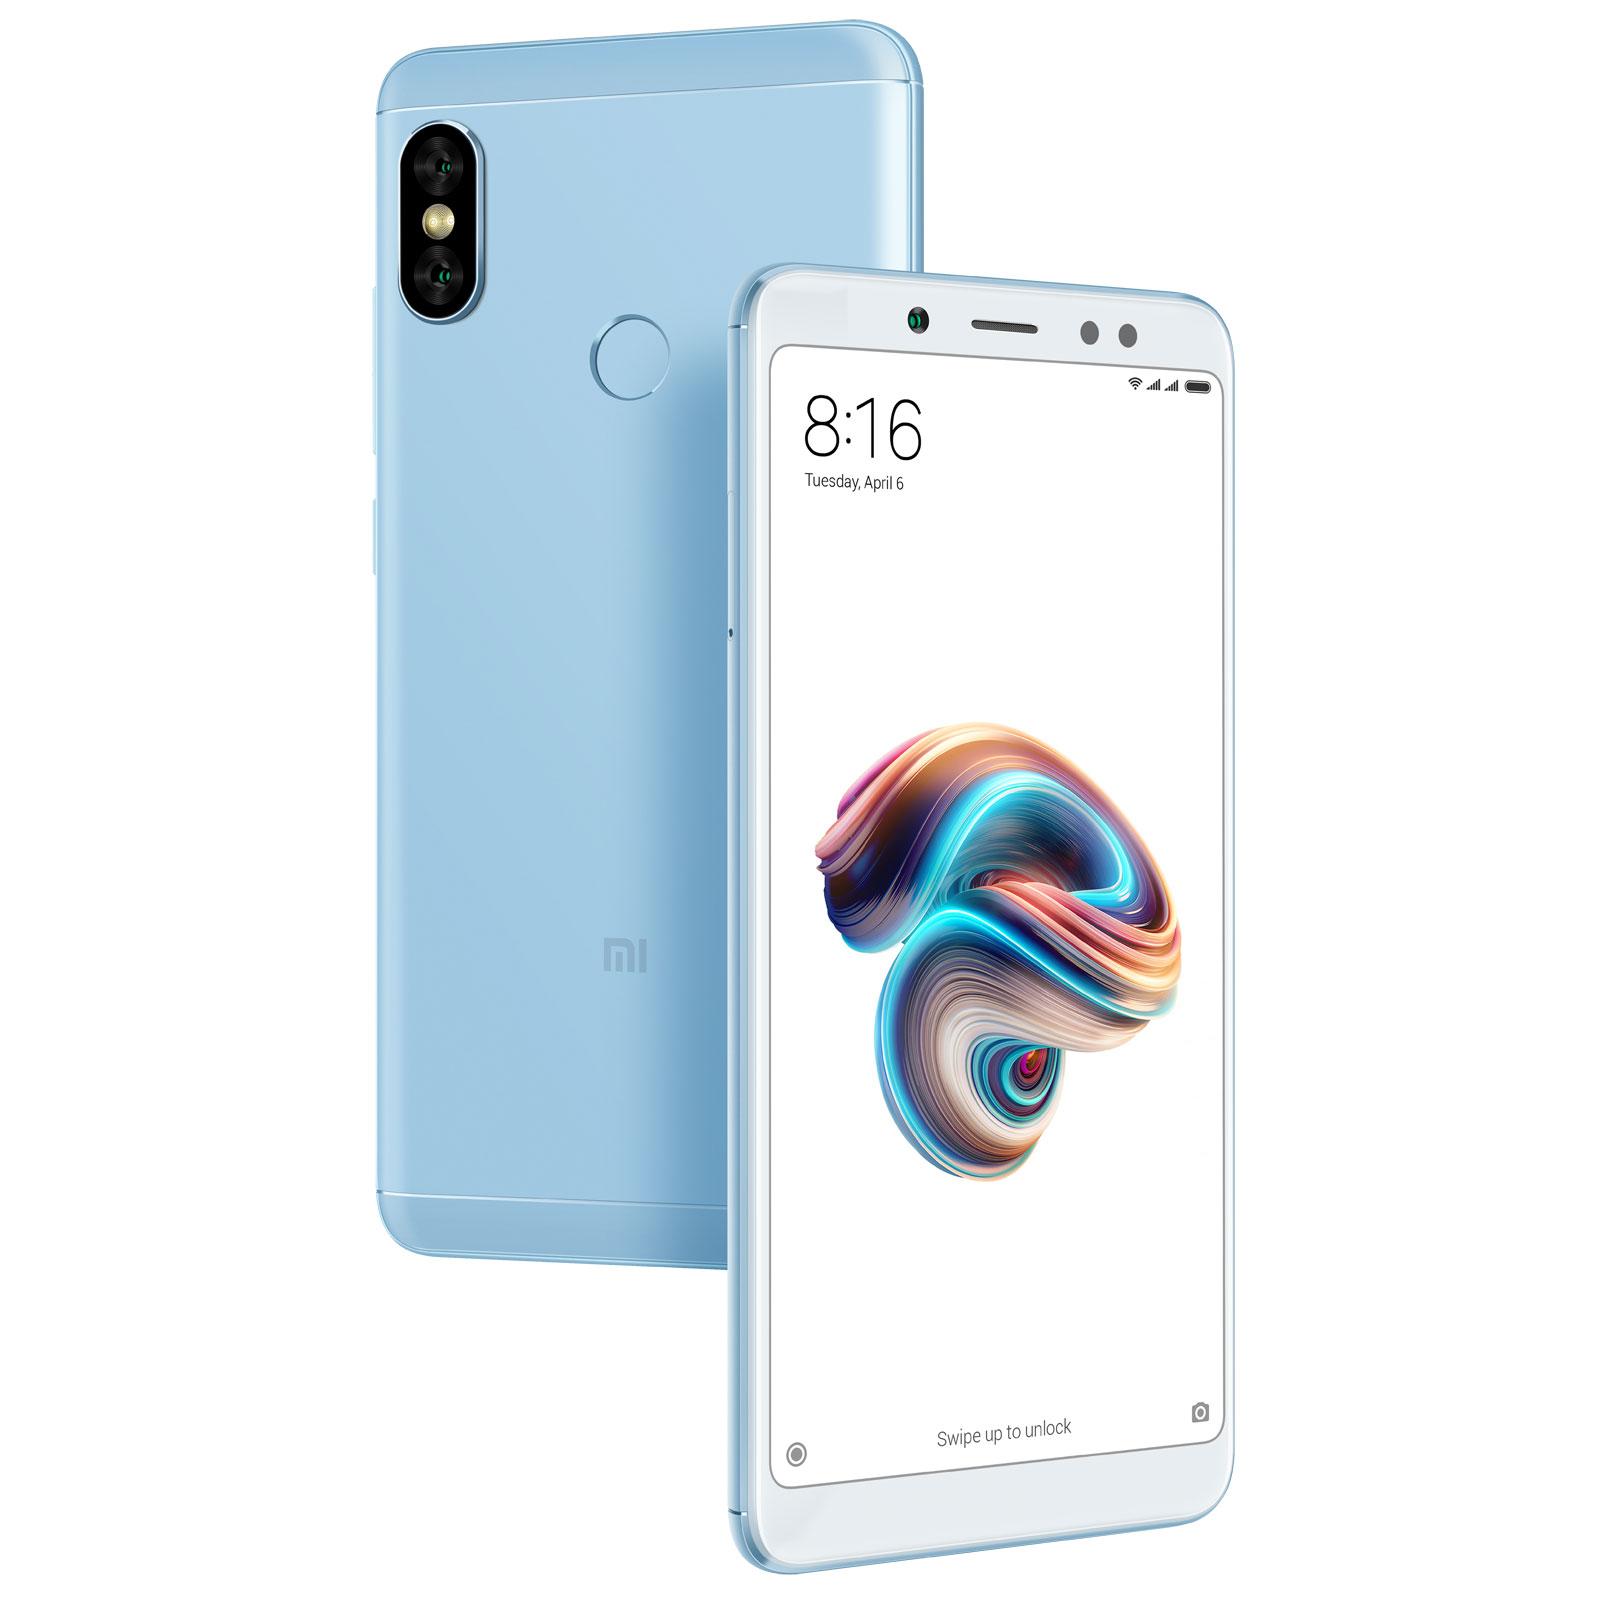 "Mobile & smartphone Xiaomi Redmi Note 5 Bleu (32 Go) Smartphone 4G-LTE Dual SIM - Snapdragon 636 Octo-Core 1.8 GHz - RAM 3 Go - Ecran tactile 5.99"" 1080 x 2160 - 32 Go - NFC/Bluetooth 5.0 - 4000 mAh - Android 8.1"